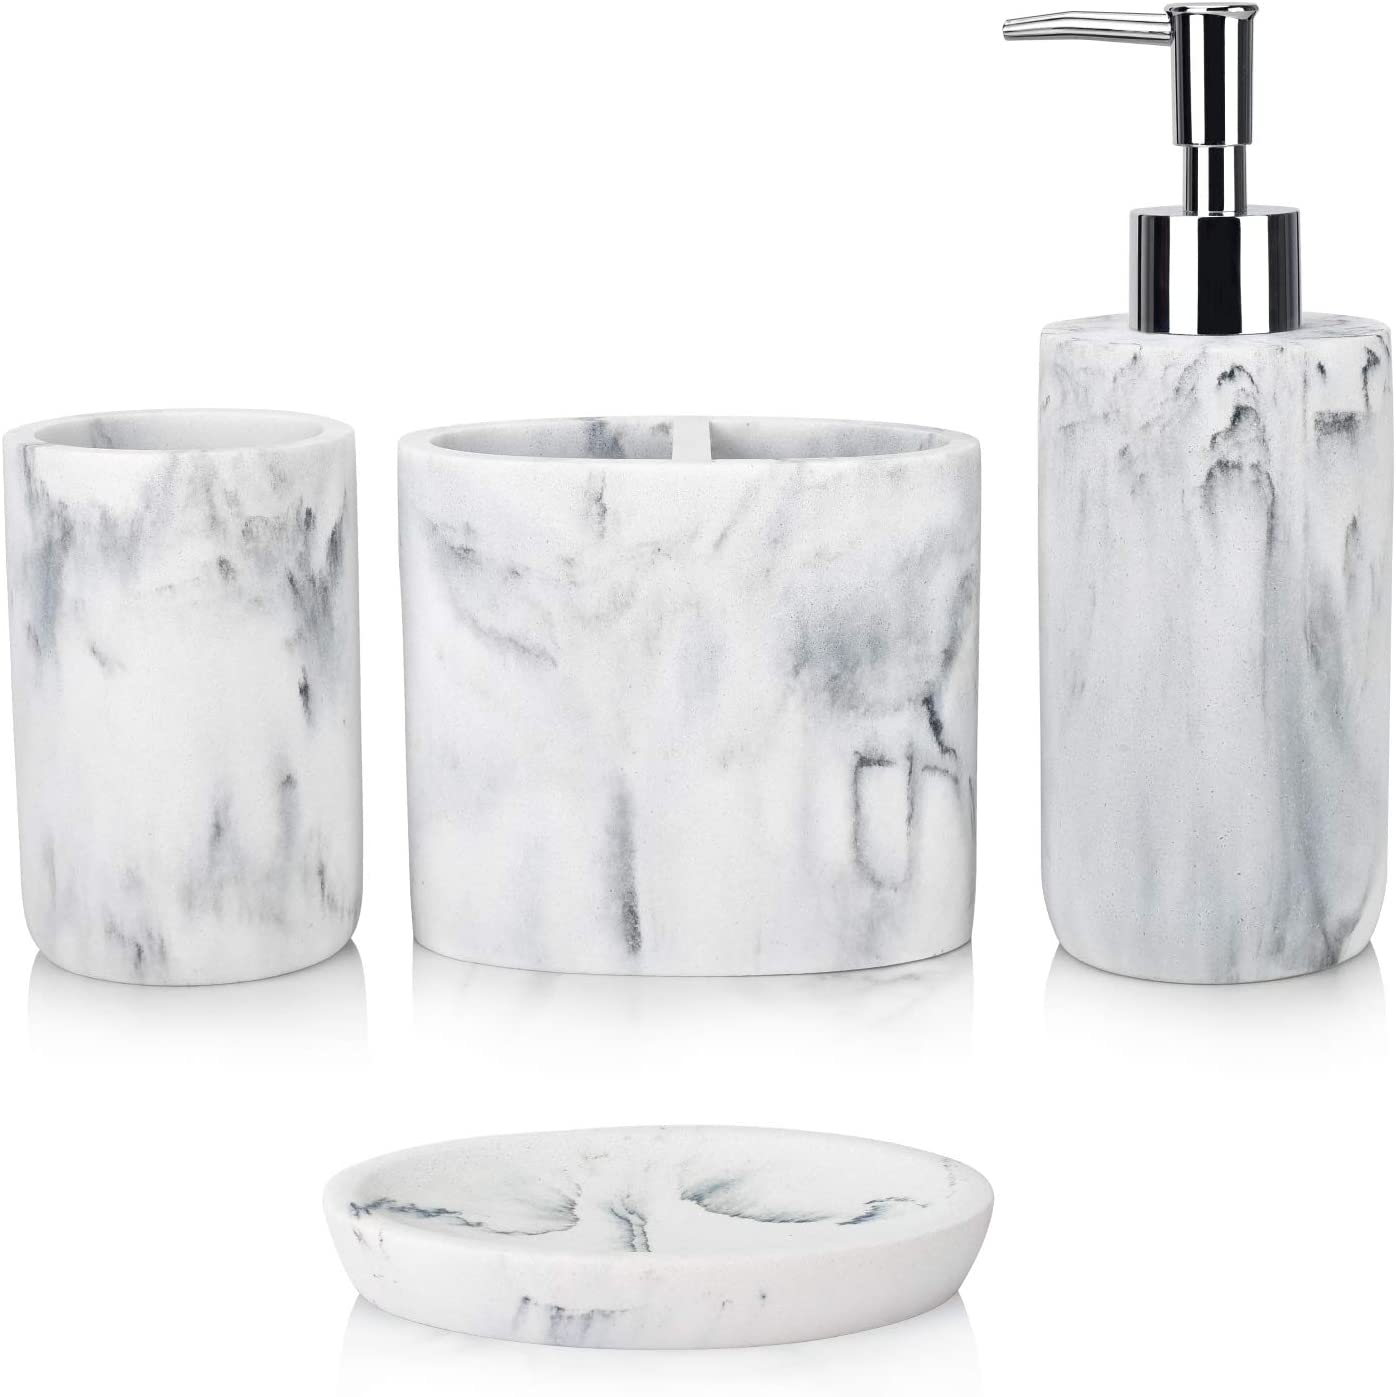 Soap Dispenser Tumbler Dish, Marble Bathroom Accessories Sets